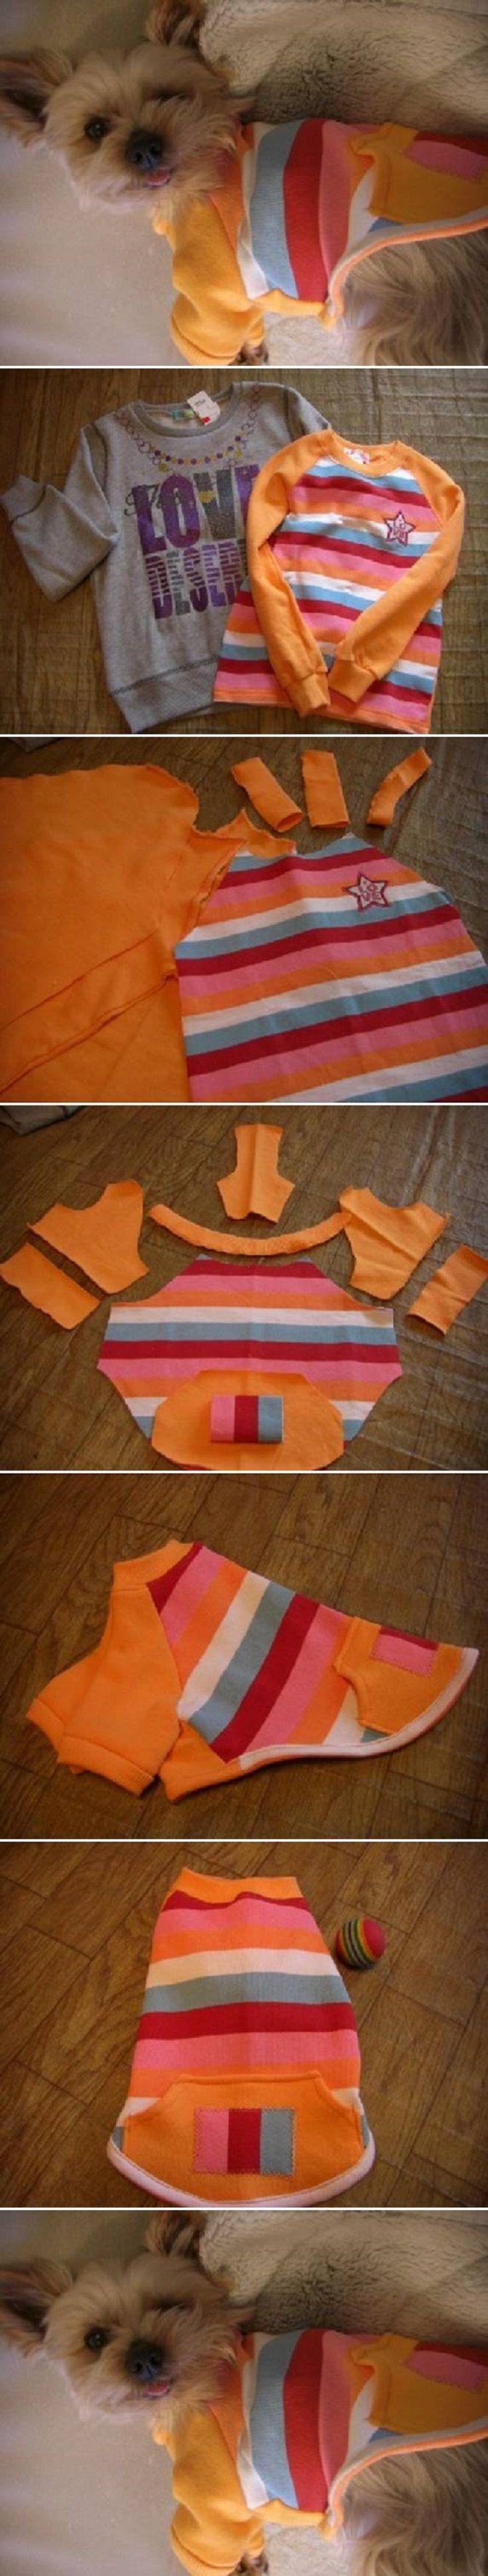 Easy DIY Dog Sweater - Top 10 Cute DIY Pet Clothes